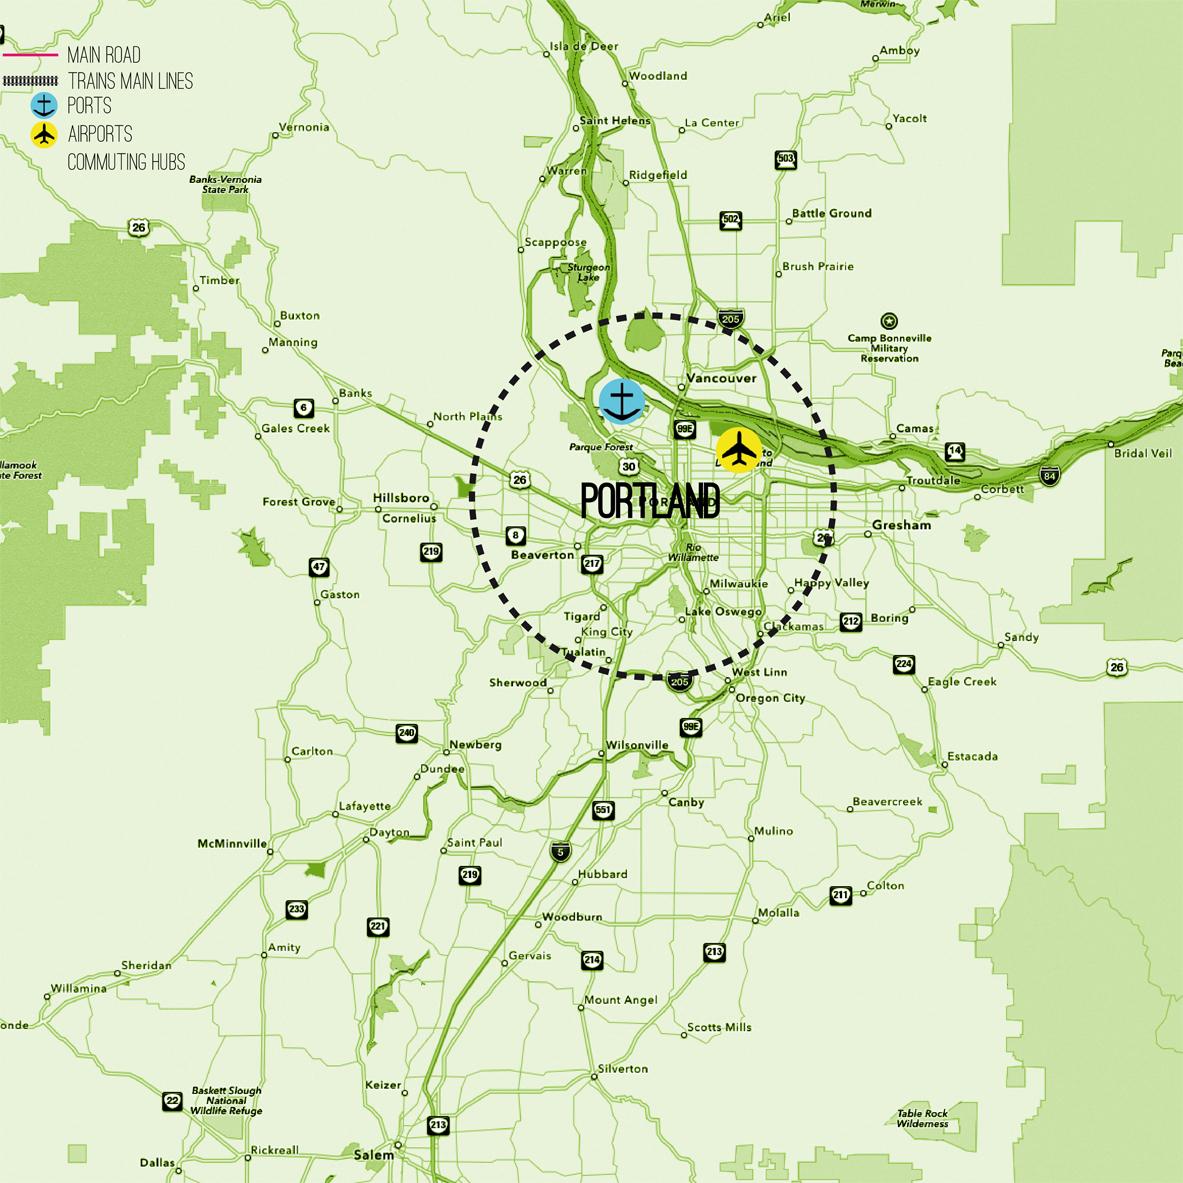 Portland Case Study - Map